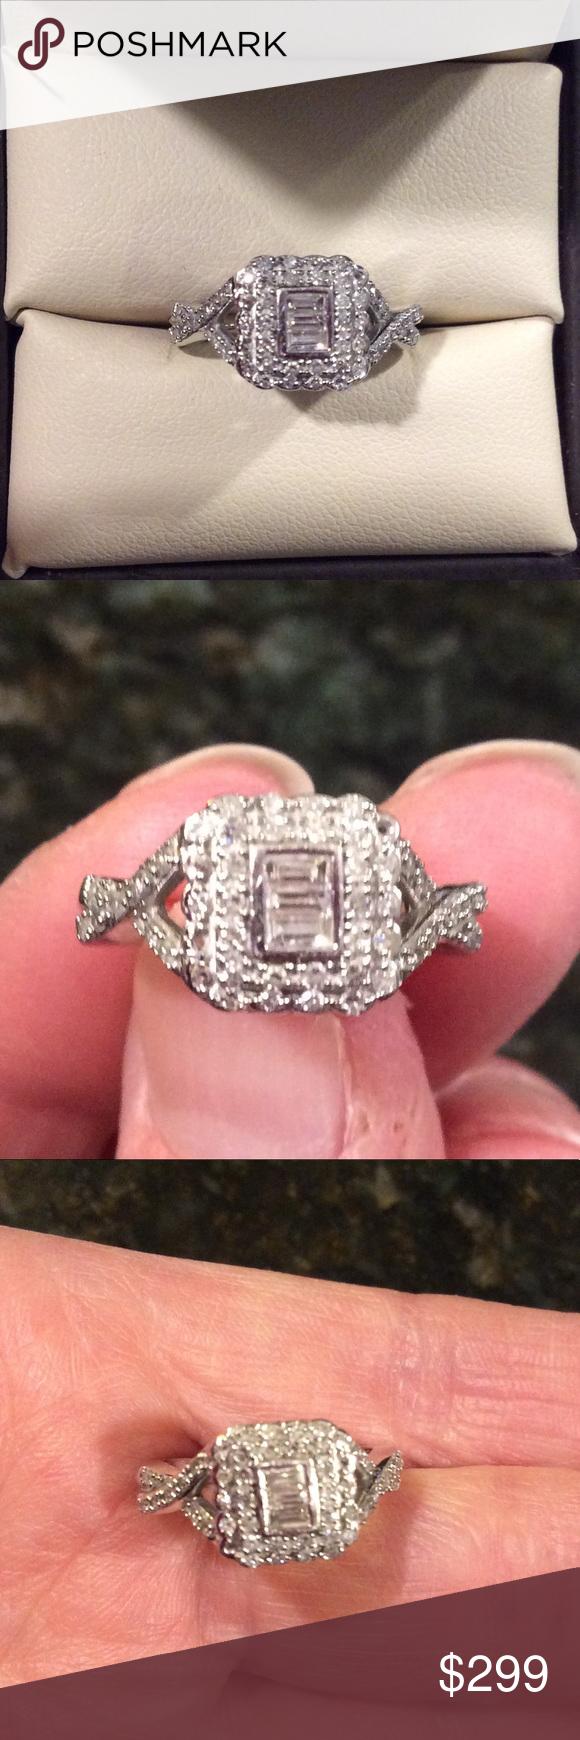 14k white gold genuine diamond ring 5 1/2 | Round diamonds, White ...